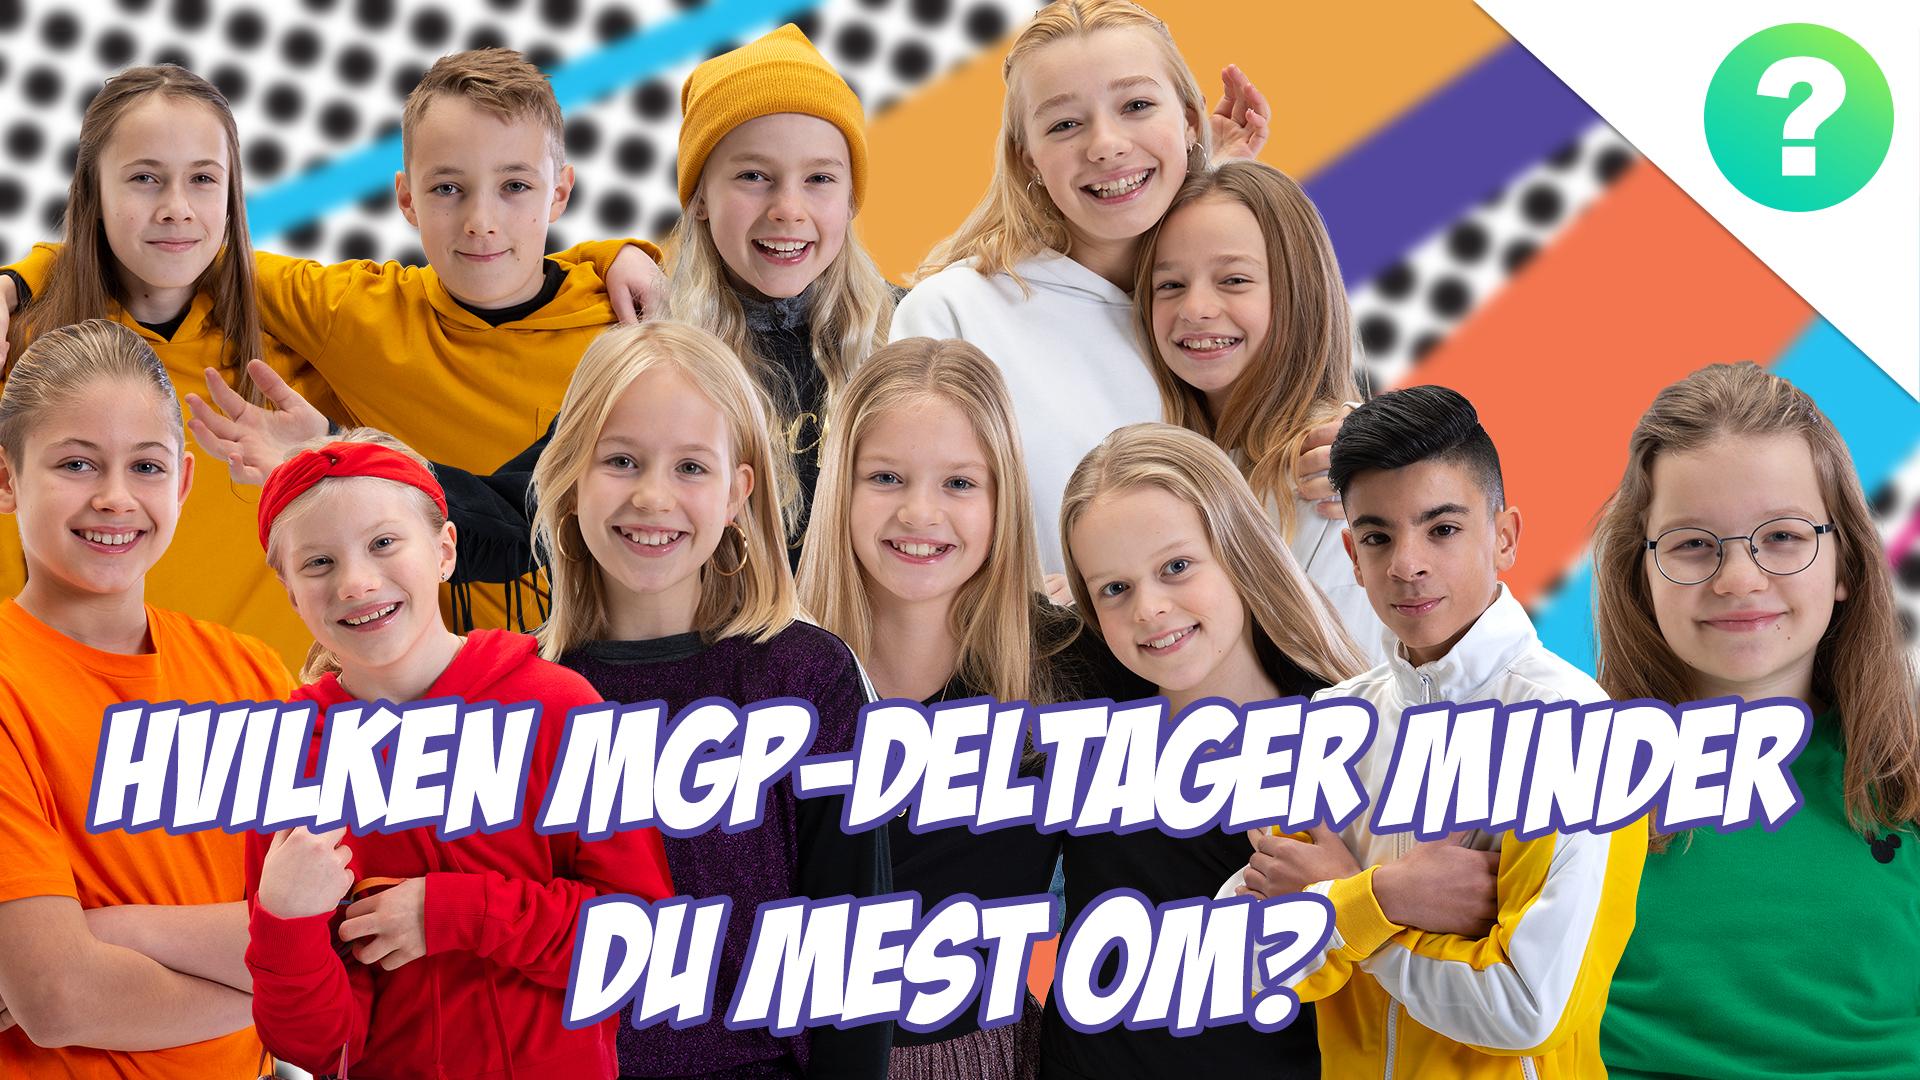 mgpdeltager-quiz1.jpg